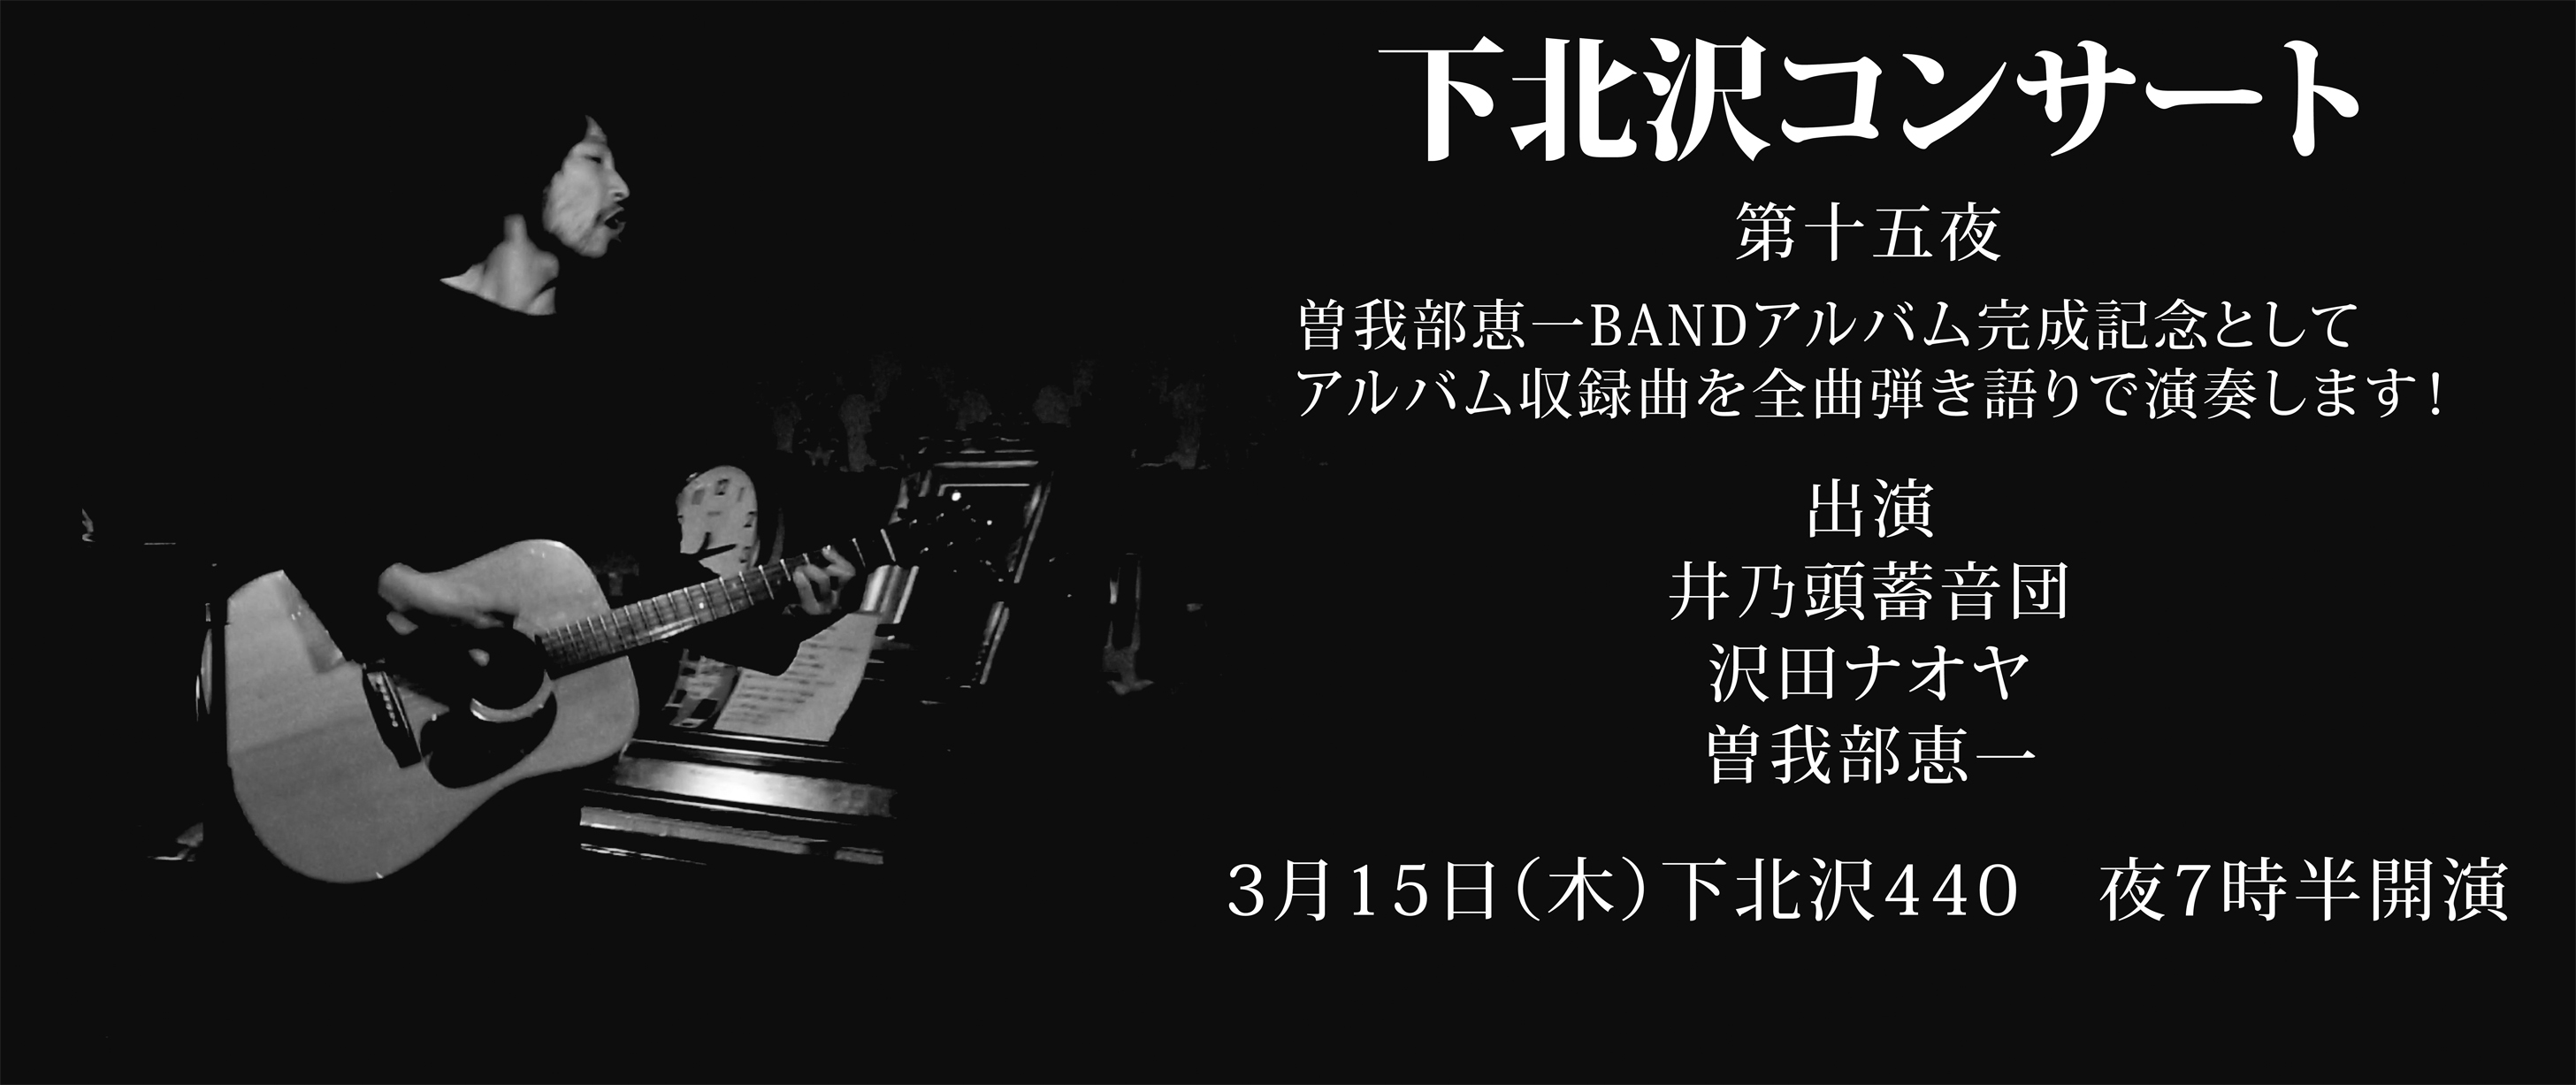 "<曽我部恵一 presents ""shimokitazawa concert"" 第十五夜> @東京 下北沢 440 (four forty)"